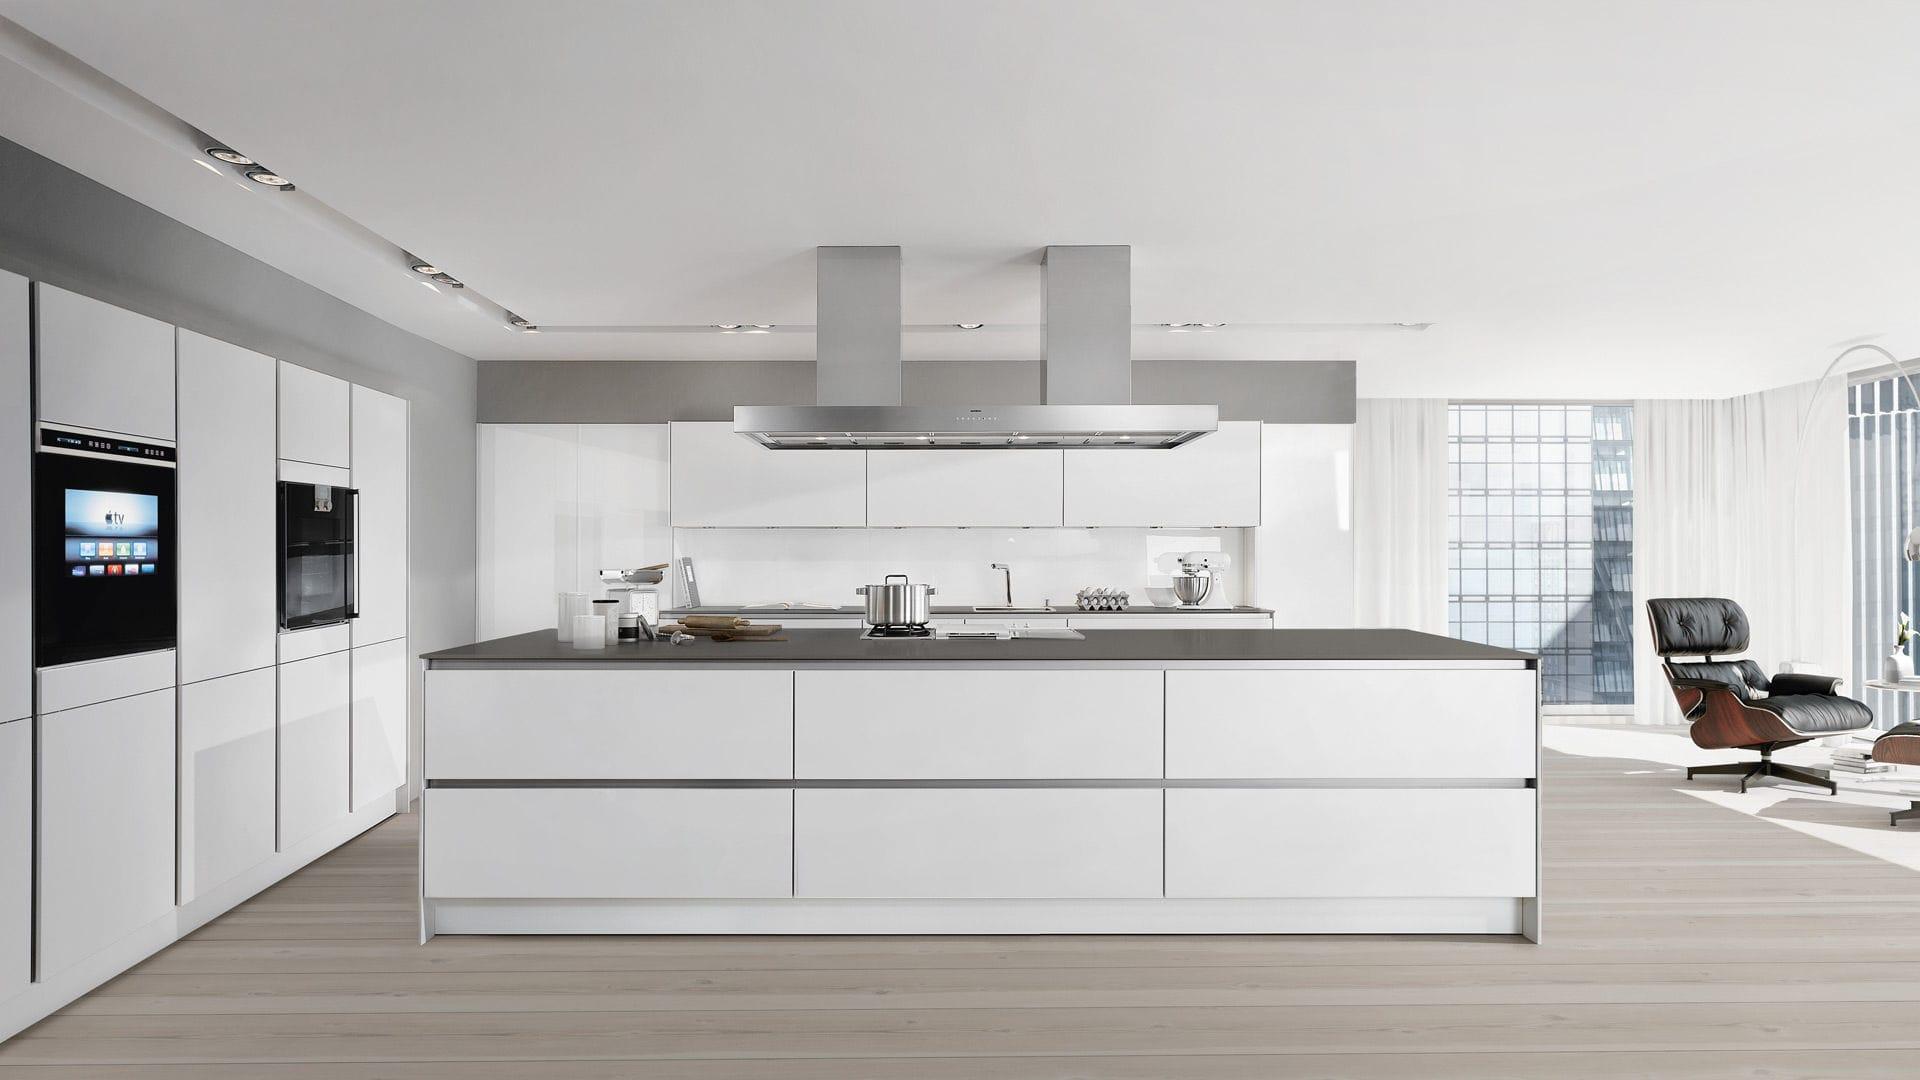 Kochinsel Tiefe moderne küche lackiertes holz holzfurnier kochinsel